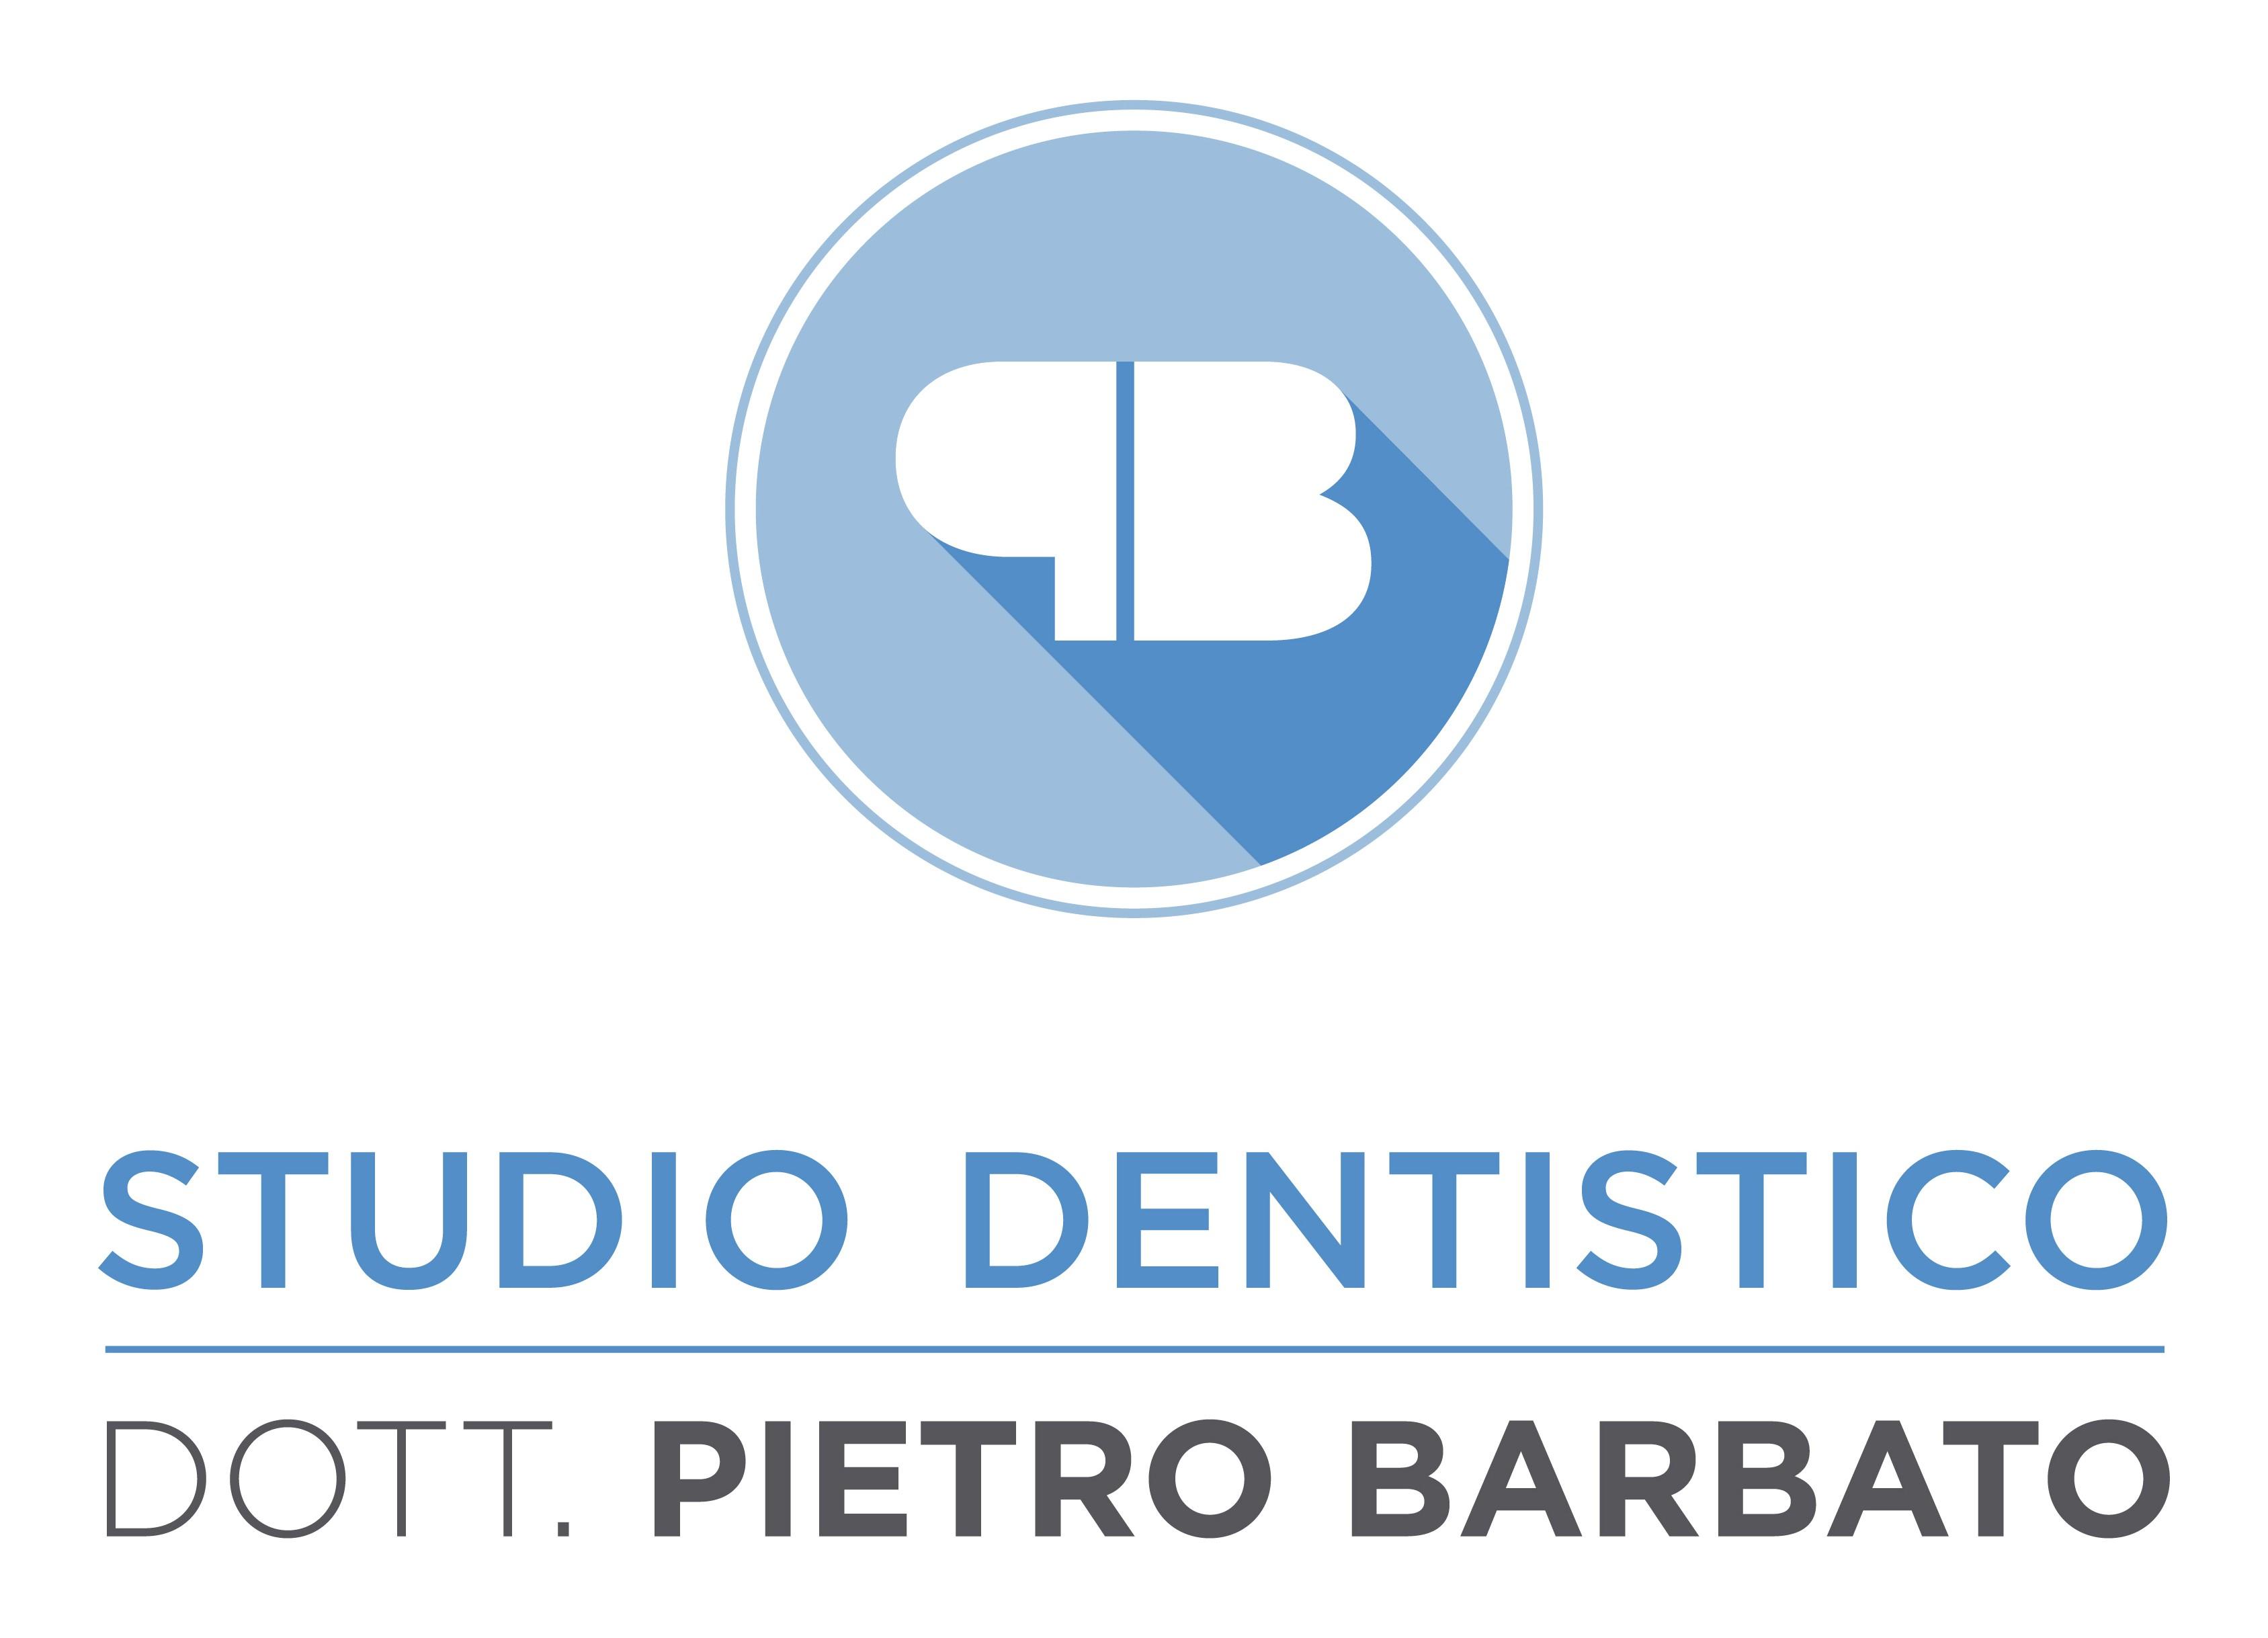 Studio Dottor Barbato